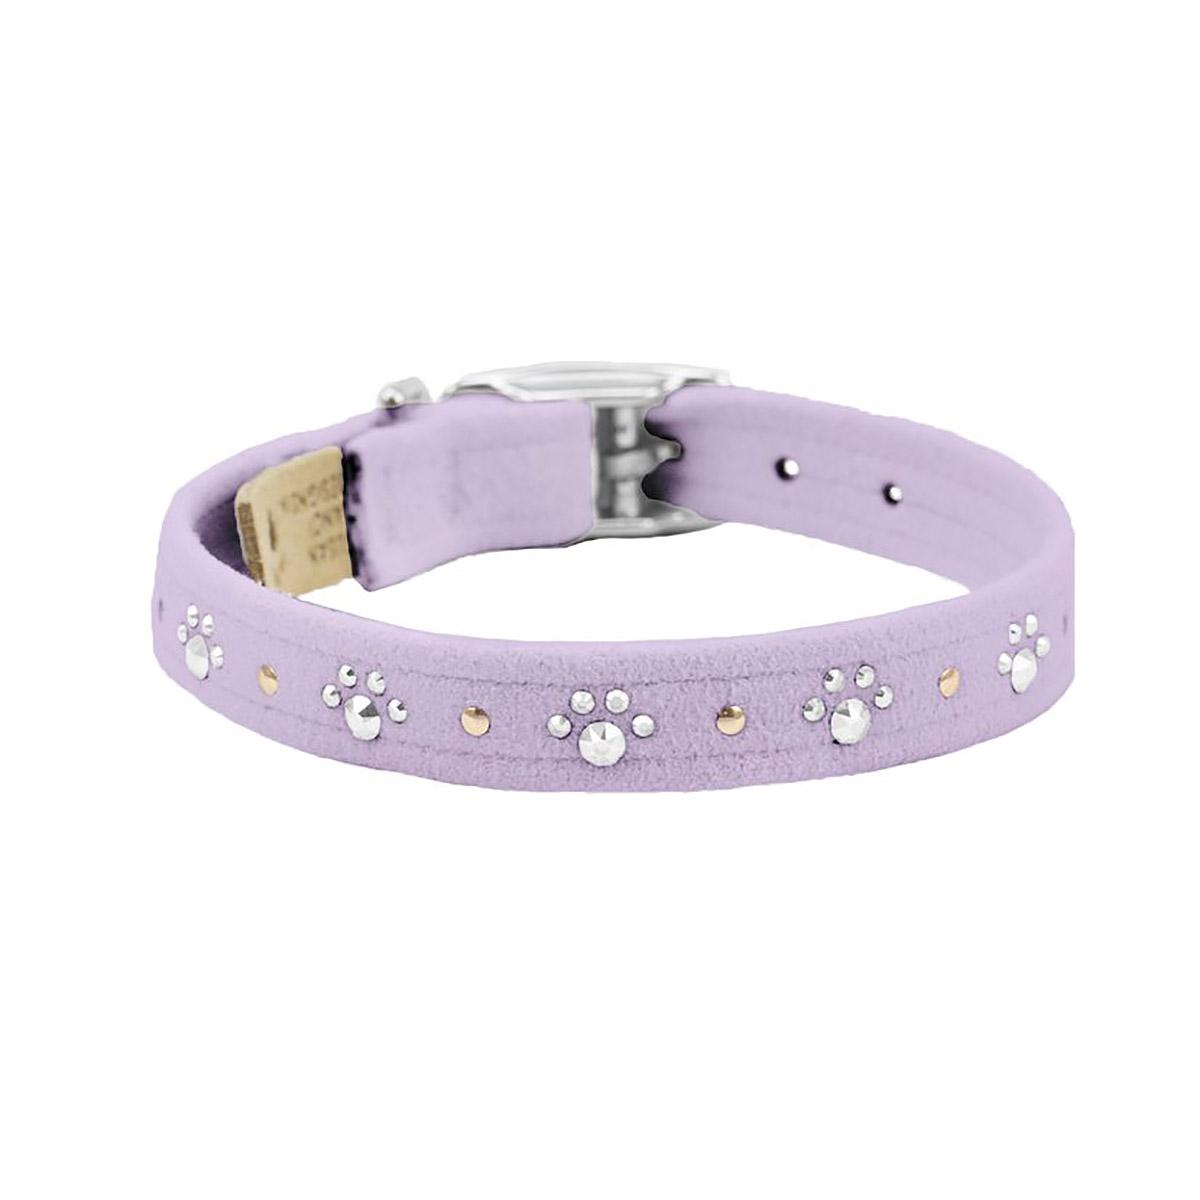 Crystal Paws Dog Collar by Susan Lanci - French Lavender